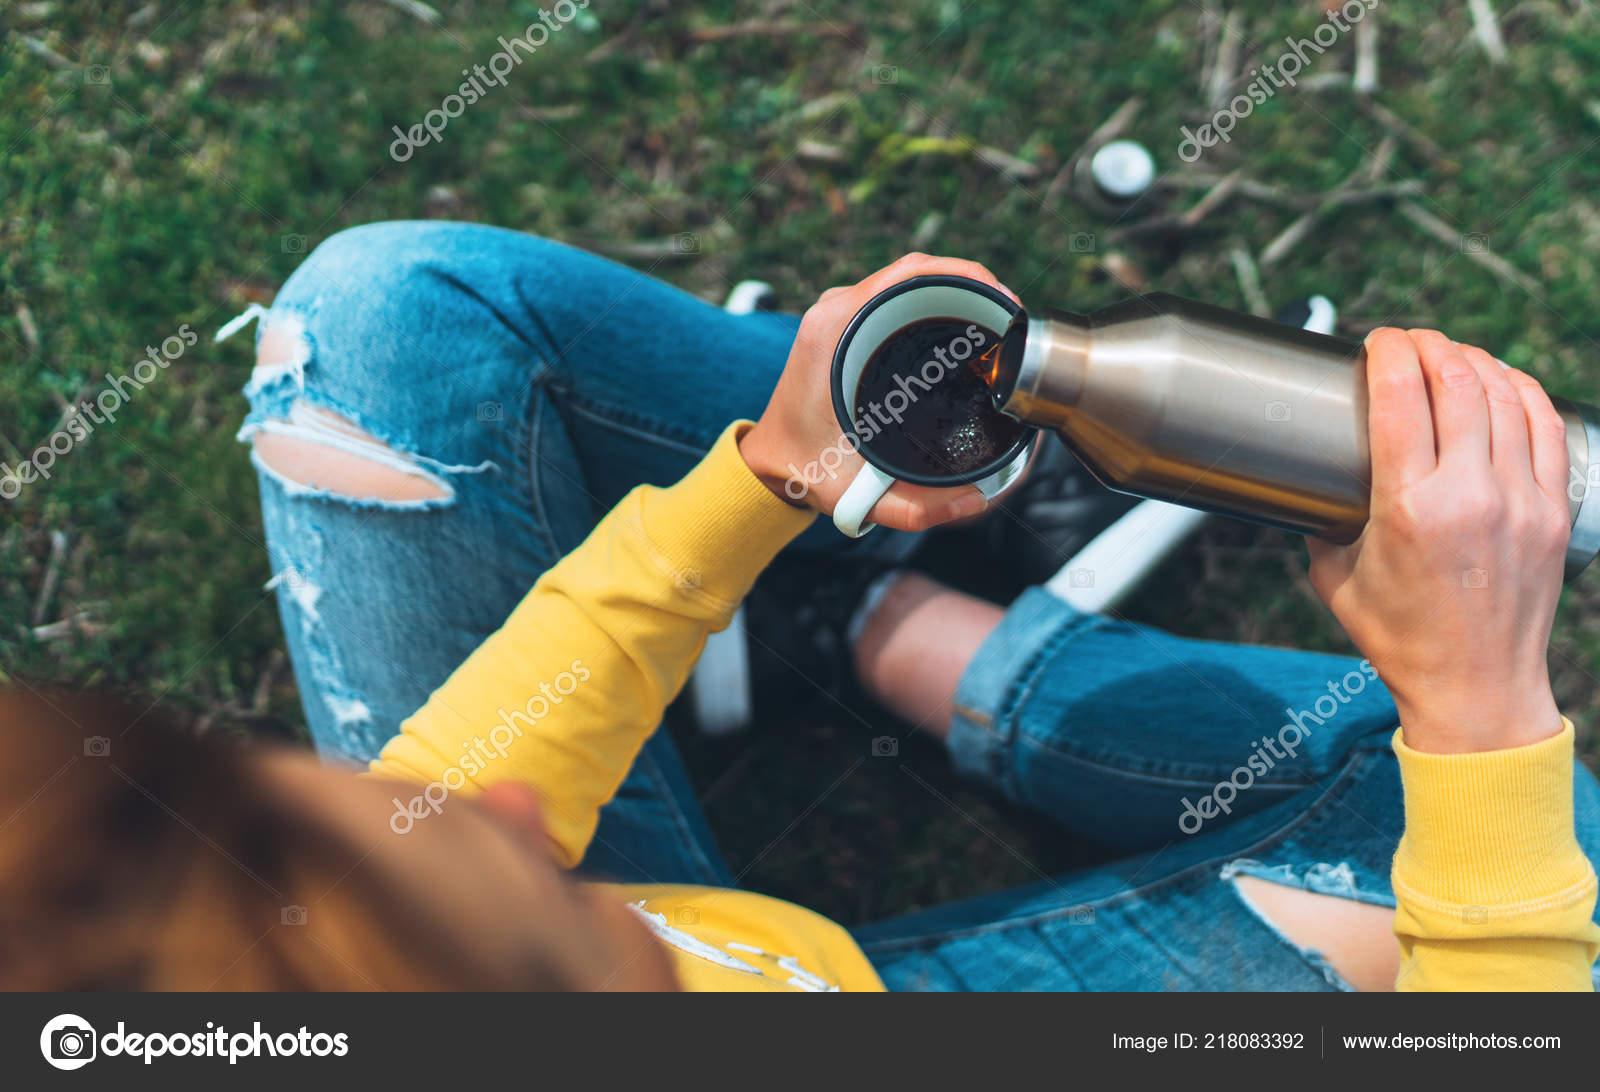 Top View Girl Holding Hands Cup Hot Tea Green Grass — Stock